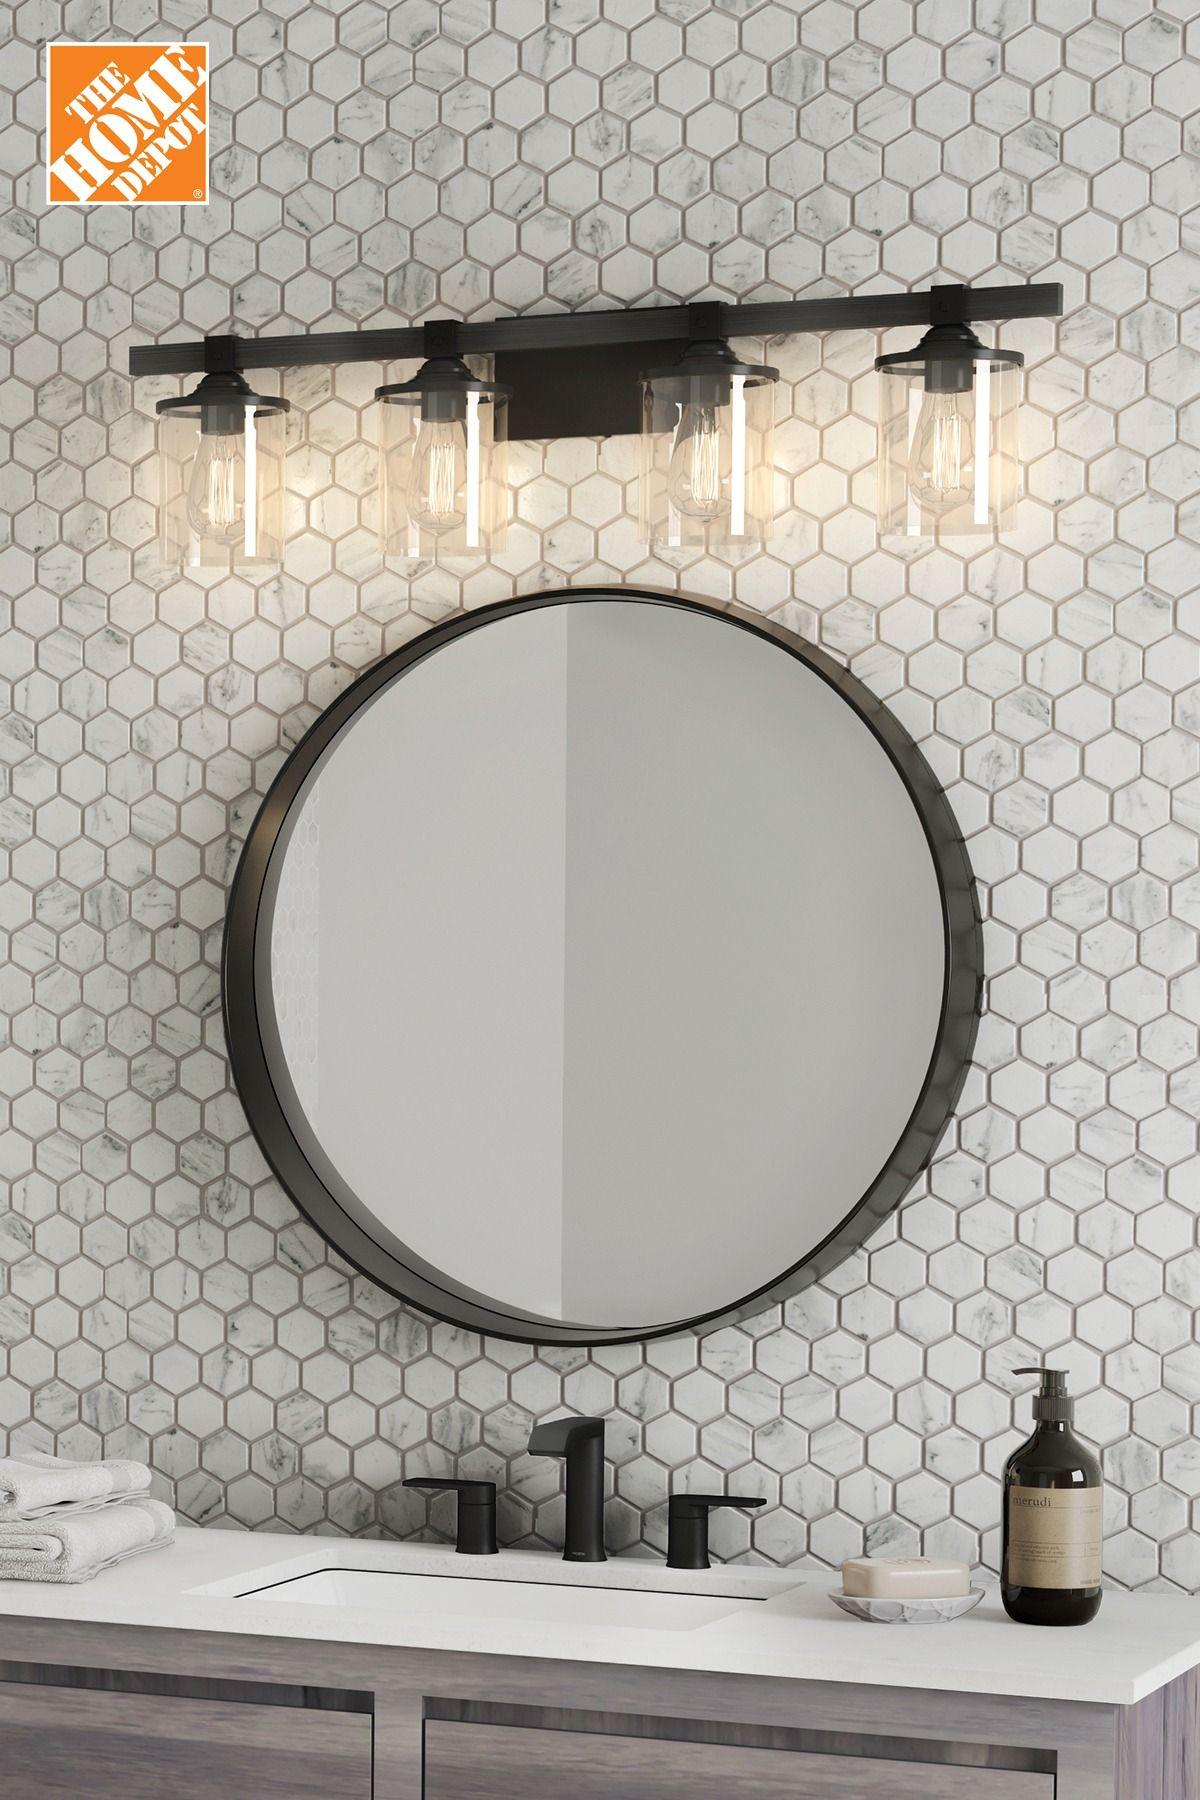 Pin On Bathroom Ideas Inspiration